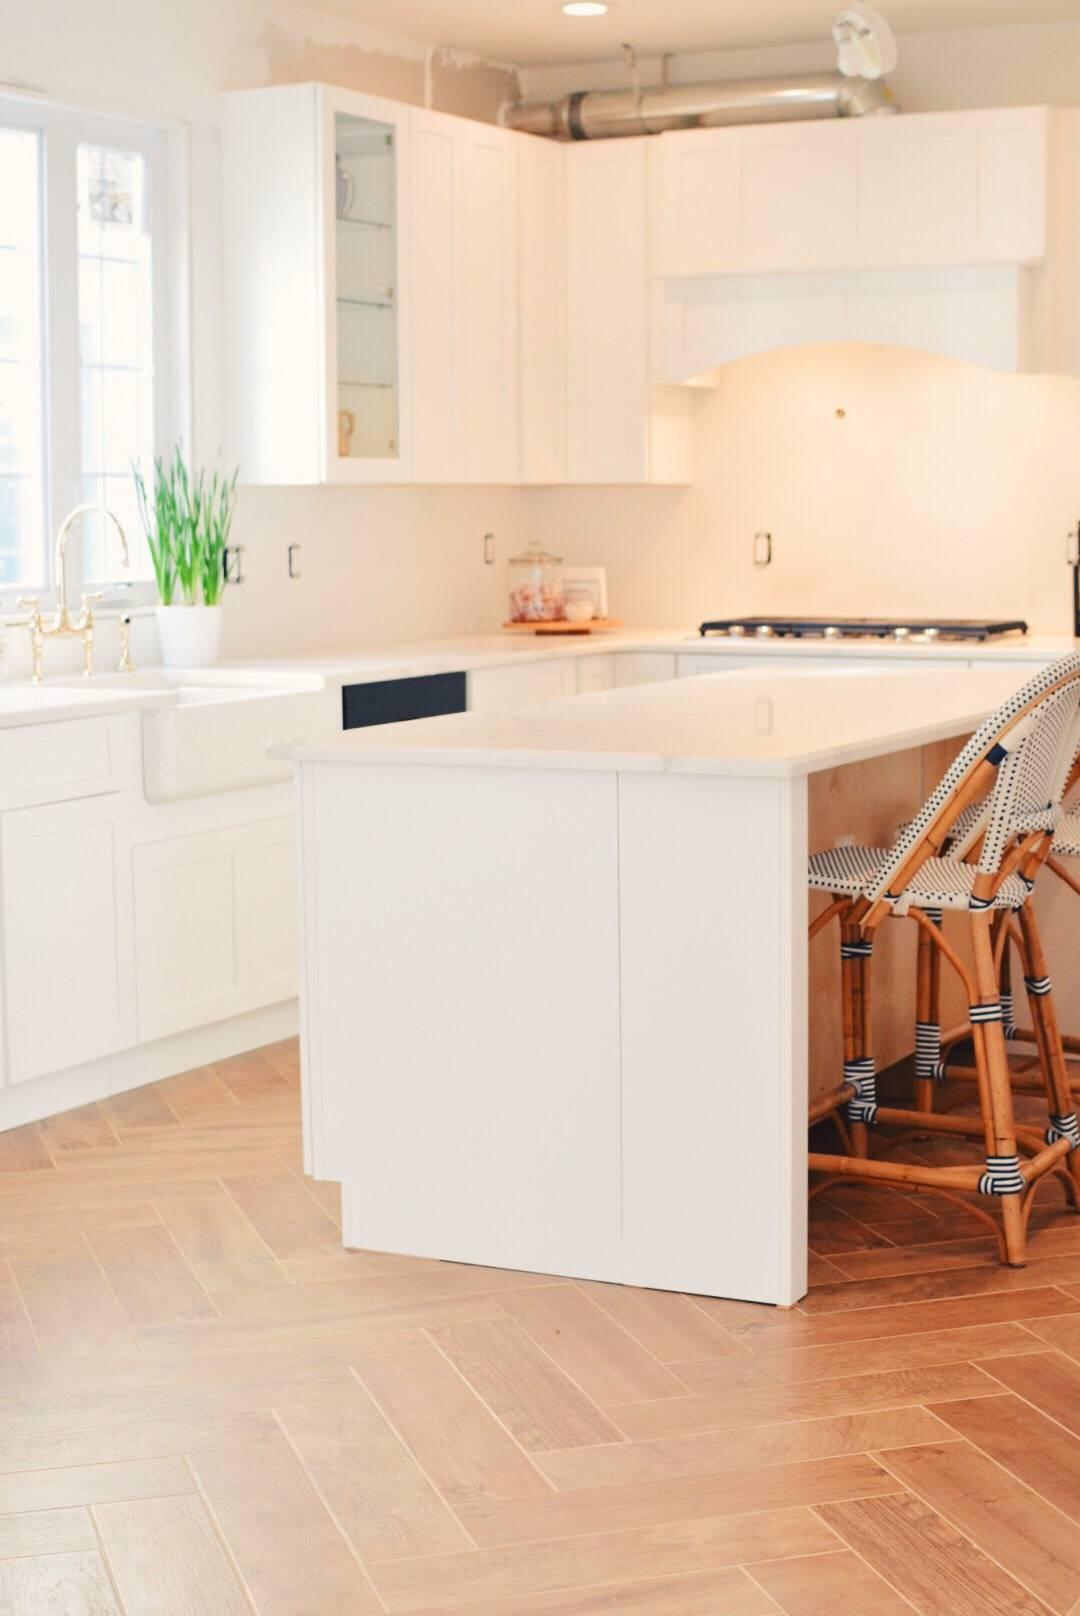 Kitchen Renovation Steps Herringbone Floors White